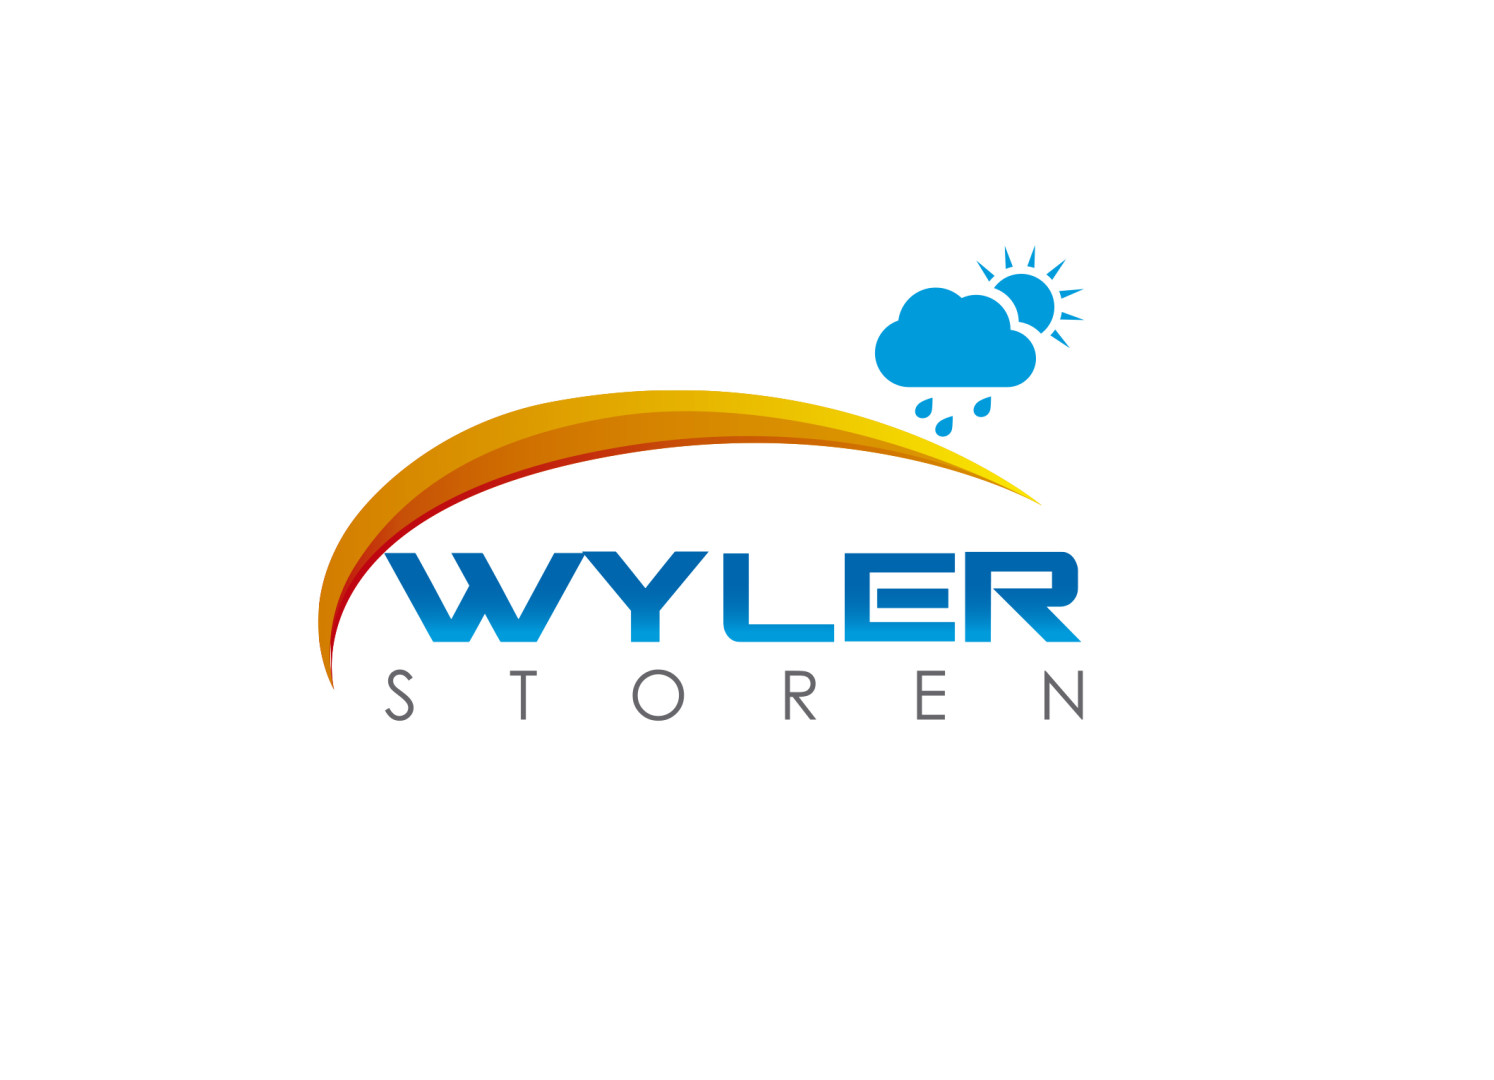 Wyler Storen